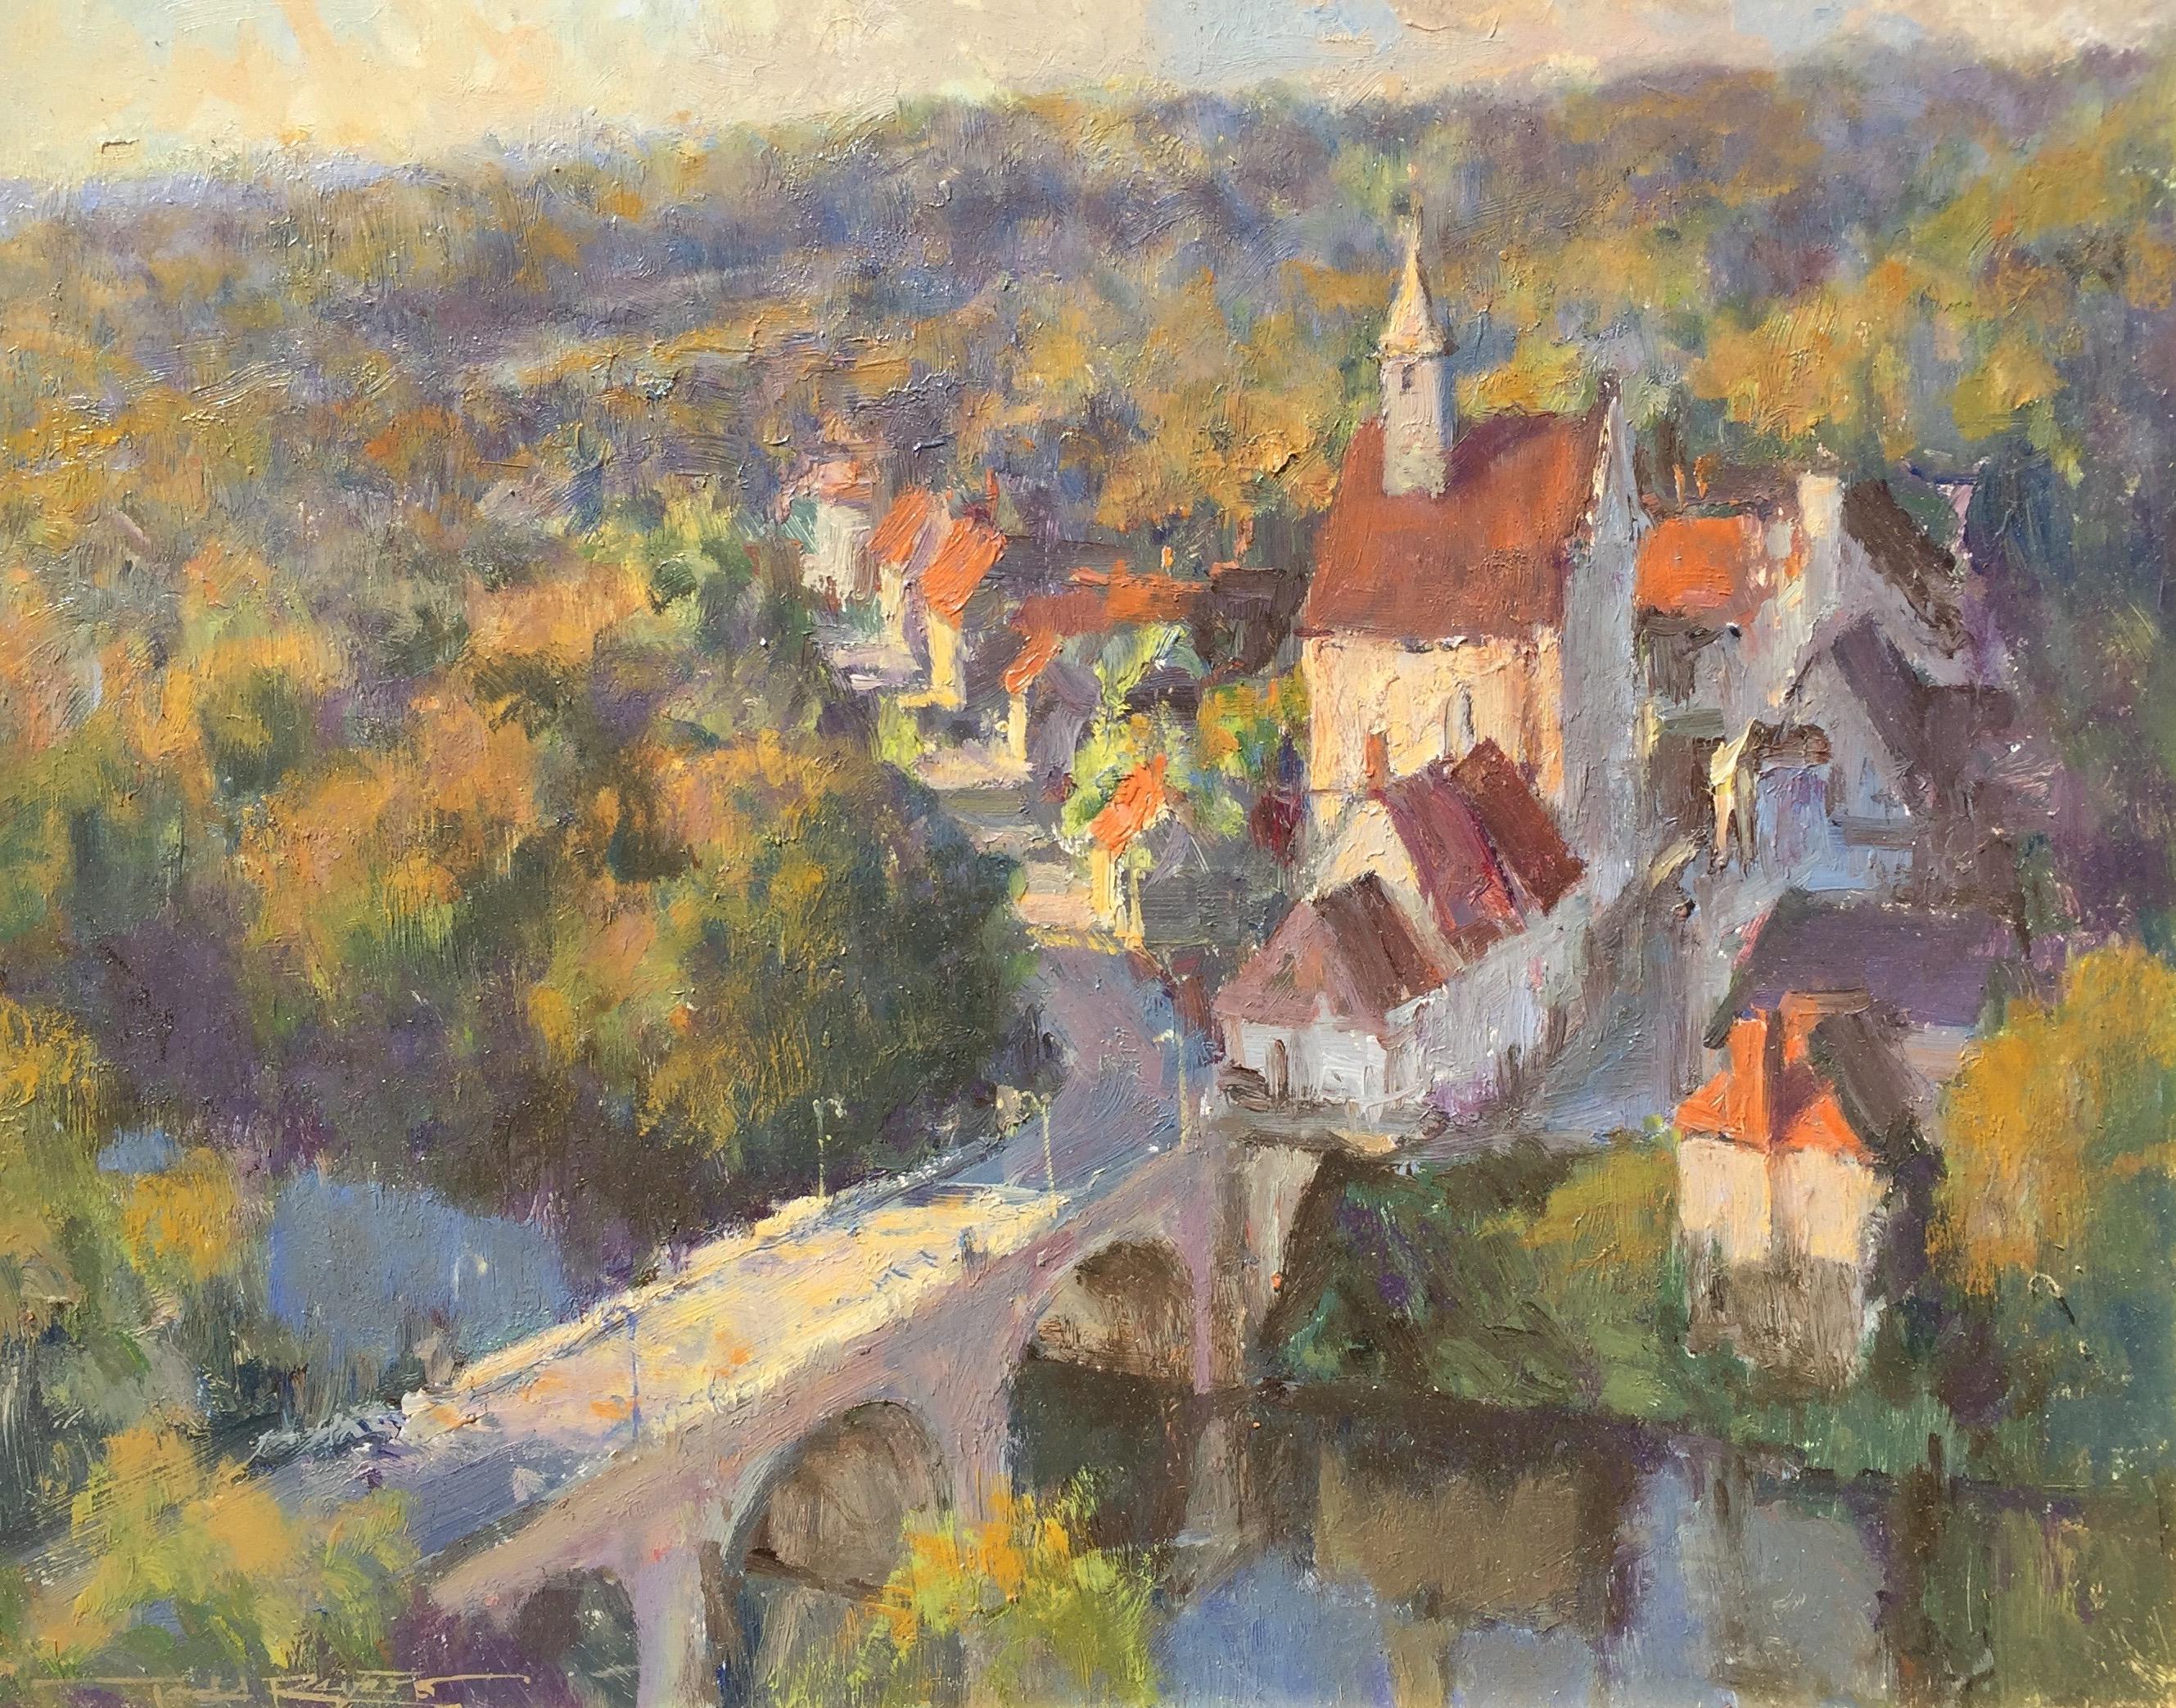 reifers-morningangles-sur-langlin-cropped